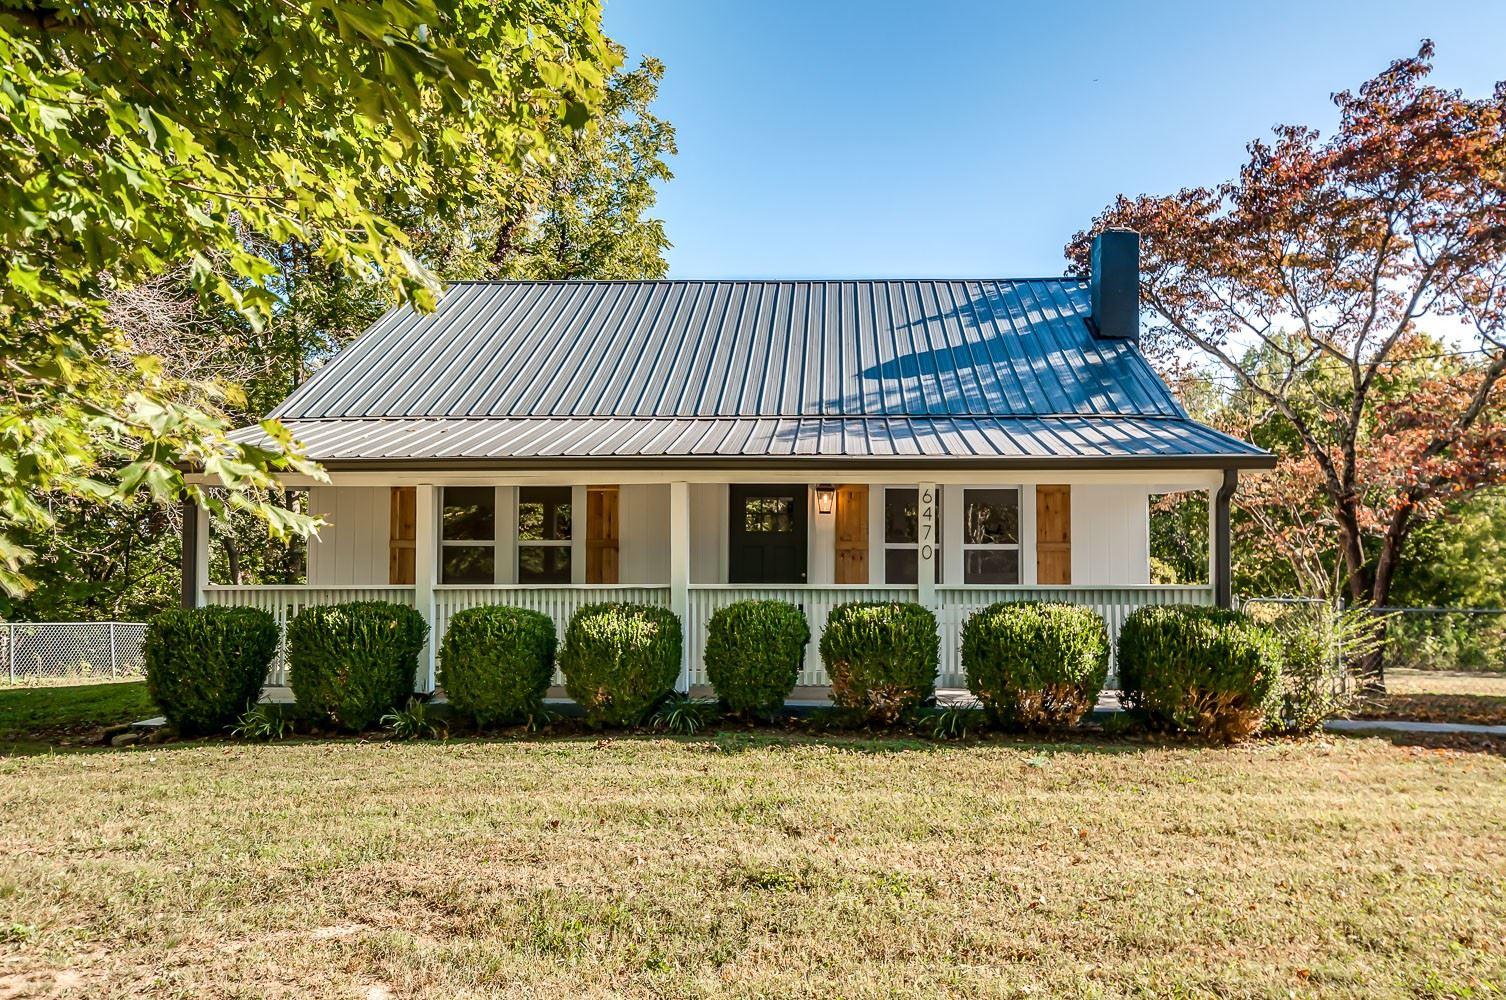 6470 Old Hickory Blvd, Whites Creek, TN 37189 - MLS#: 2195999